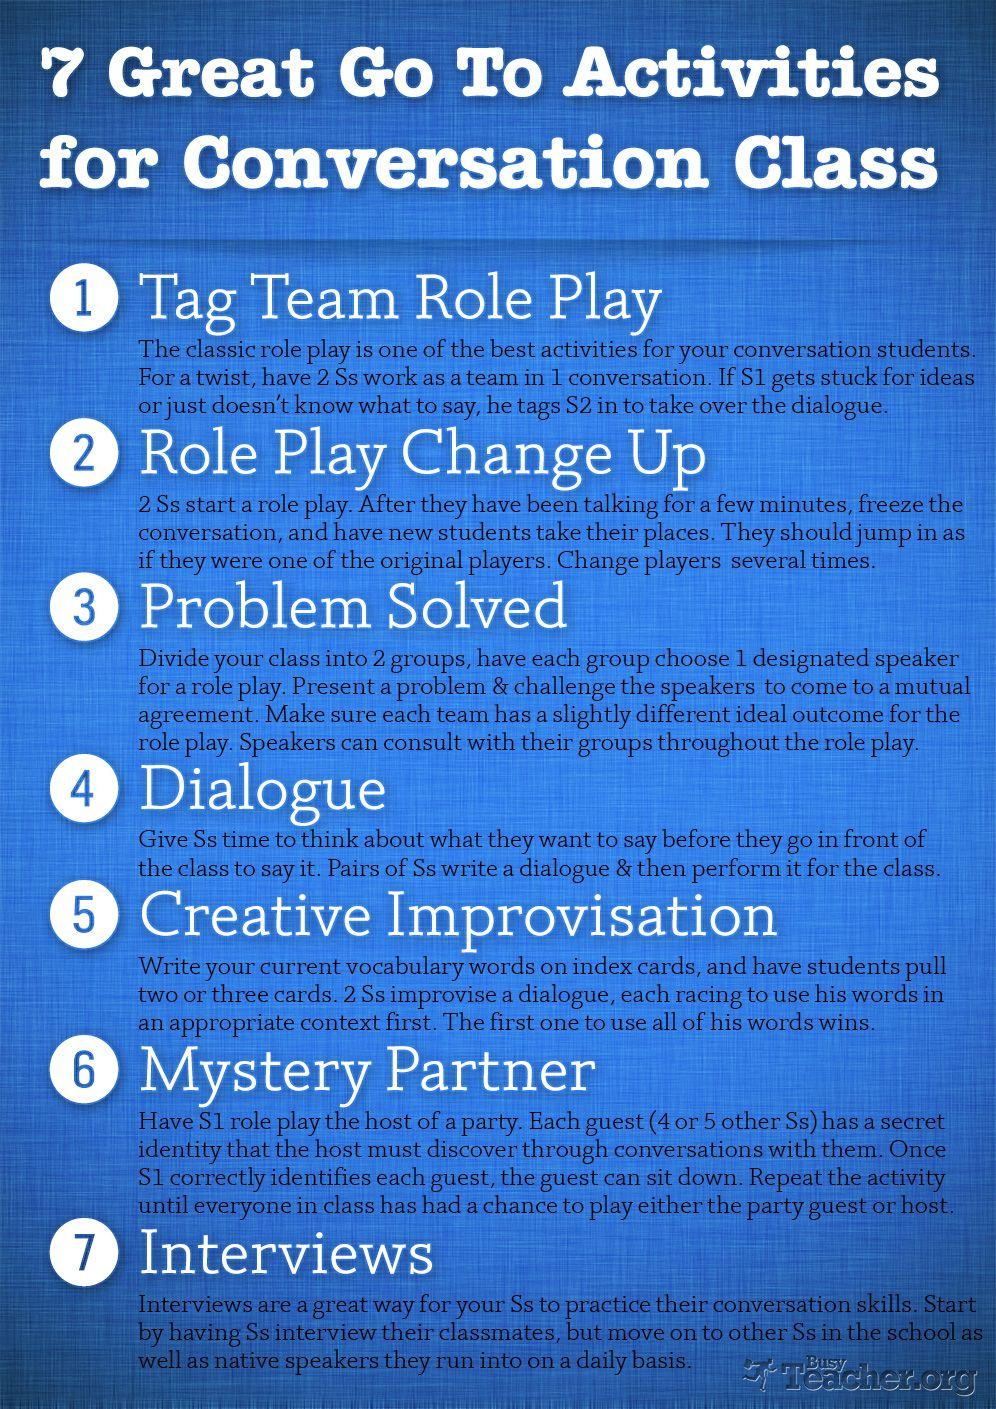 Original ideas for your problem: creativity plus improvisation